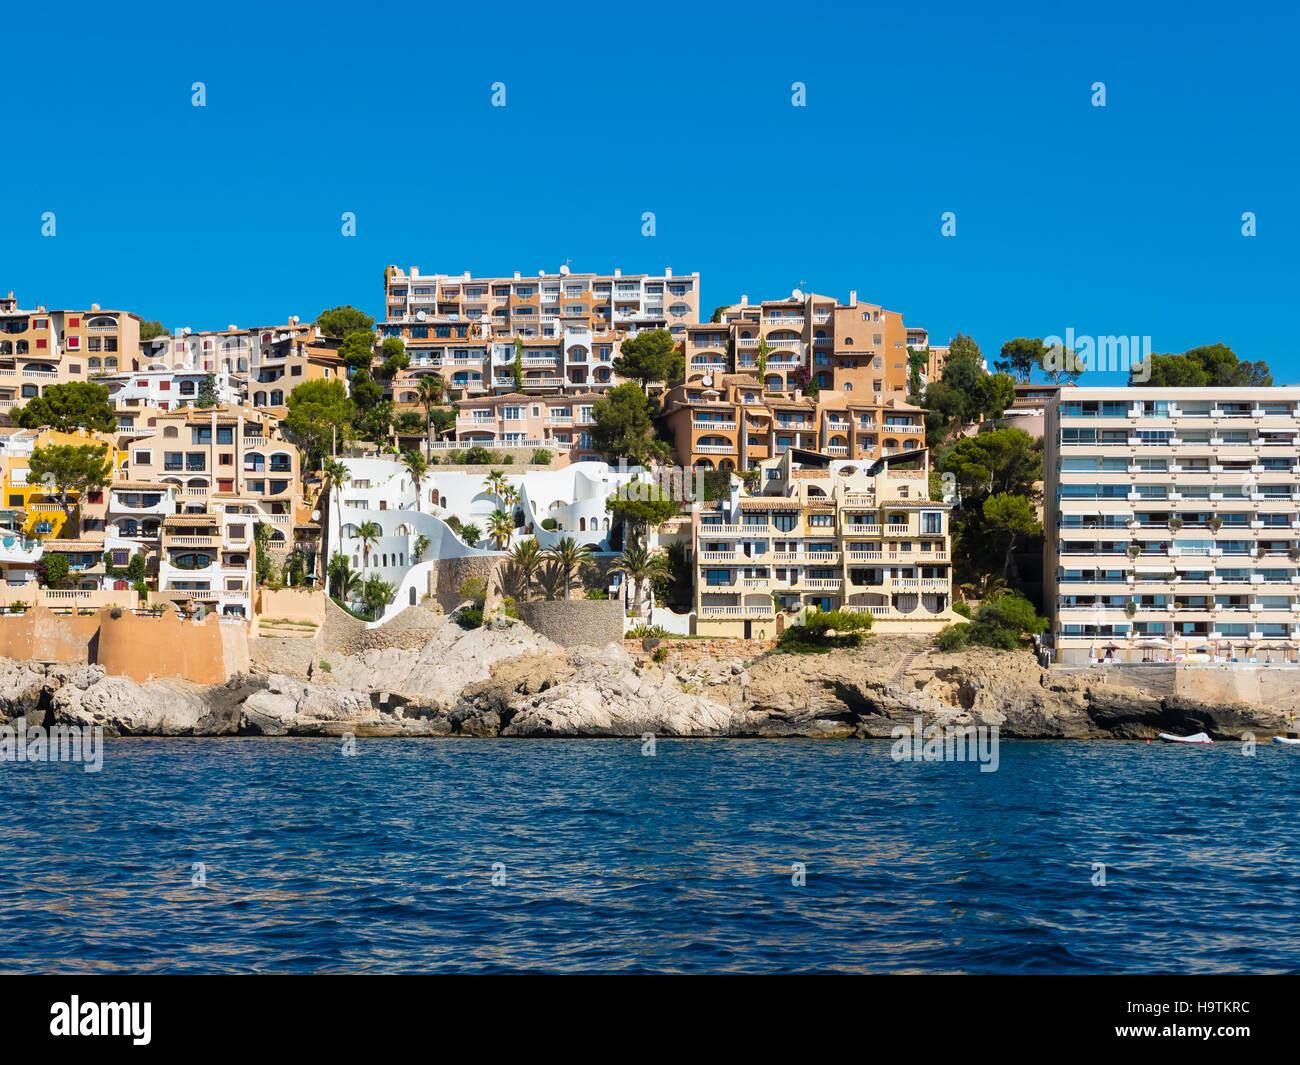 Wohnungen, Cala Fornels, Mallorca, Balearen, Spanien Stockfoto